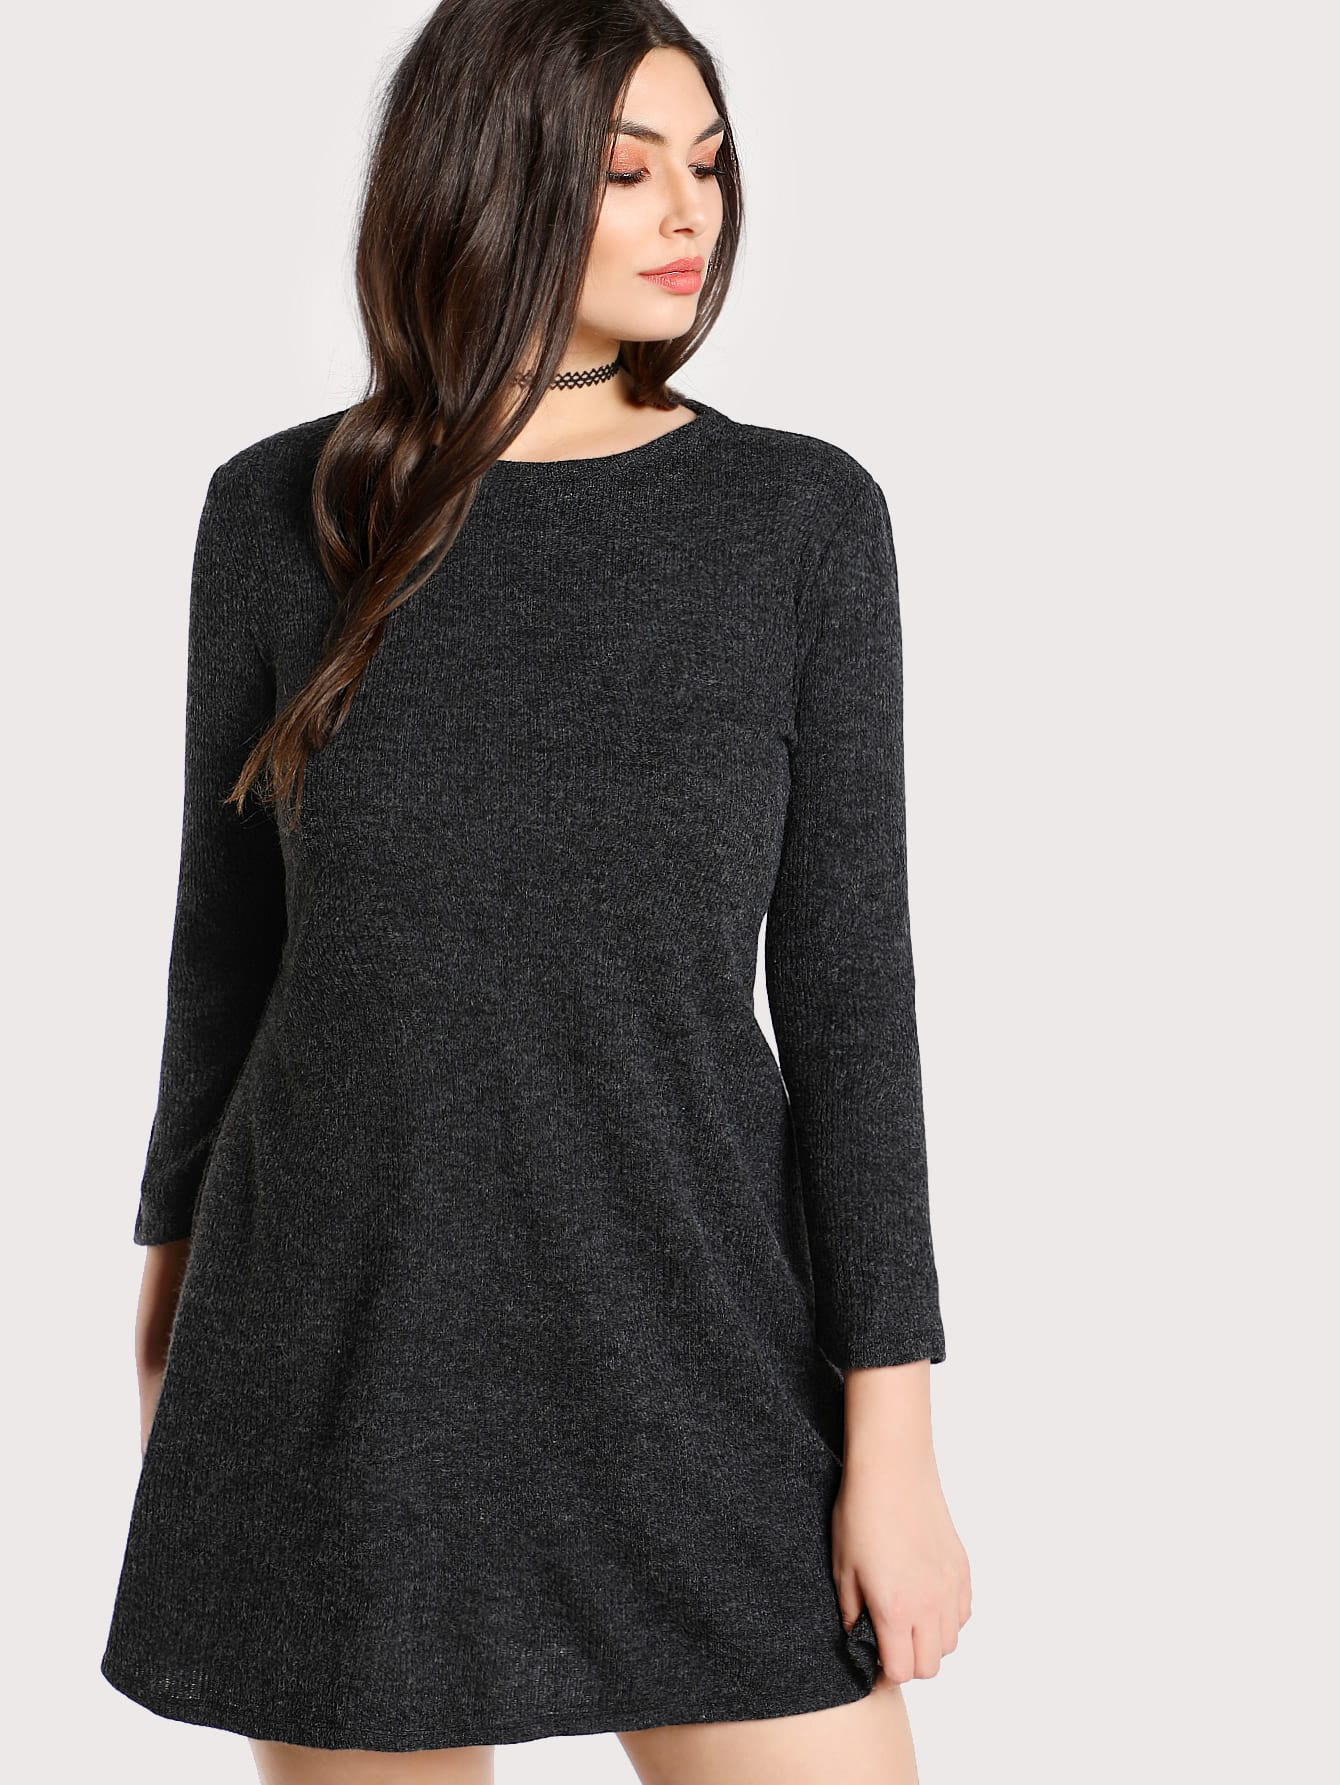 Heather Knit Tee Dress heather knit dolphin hem tee dress